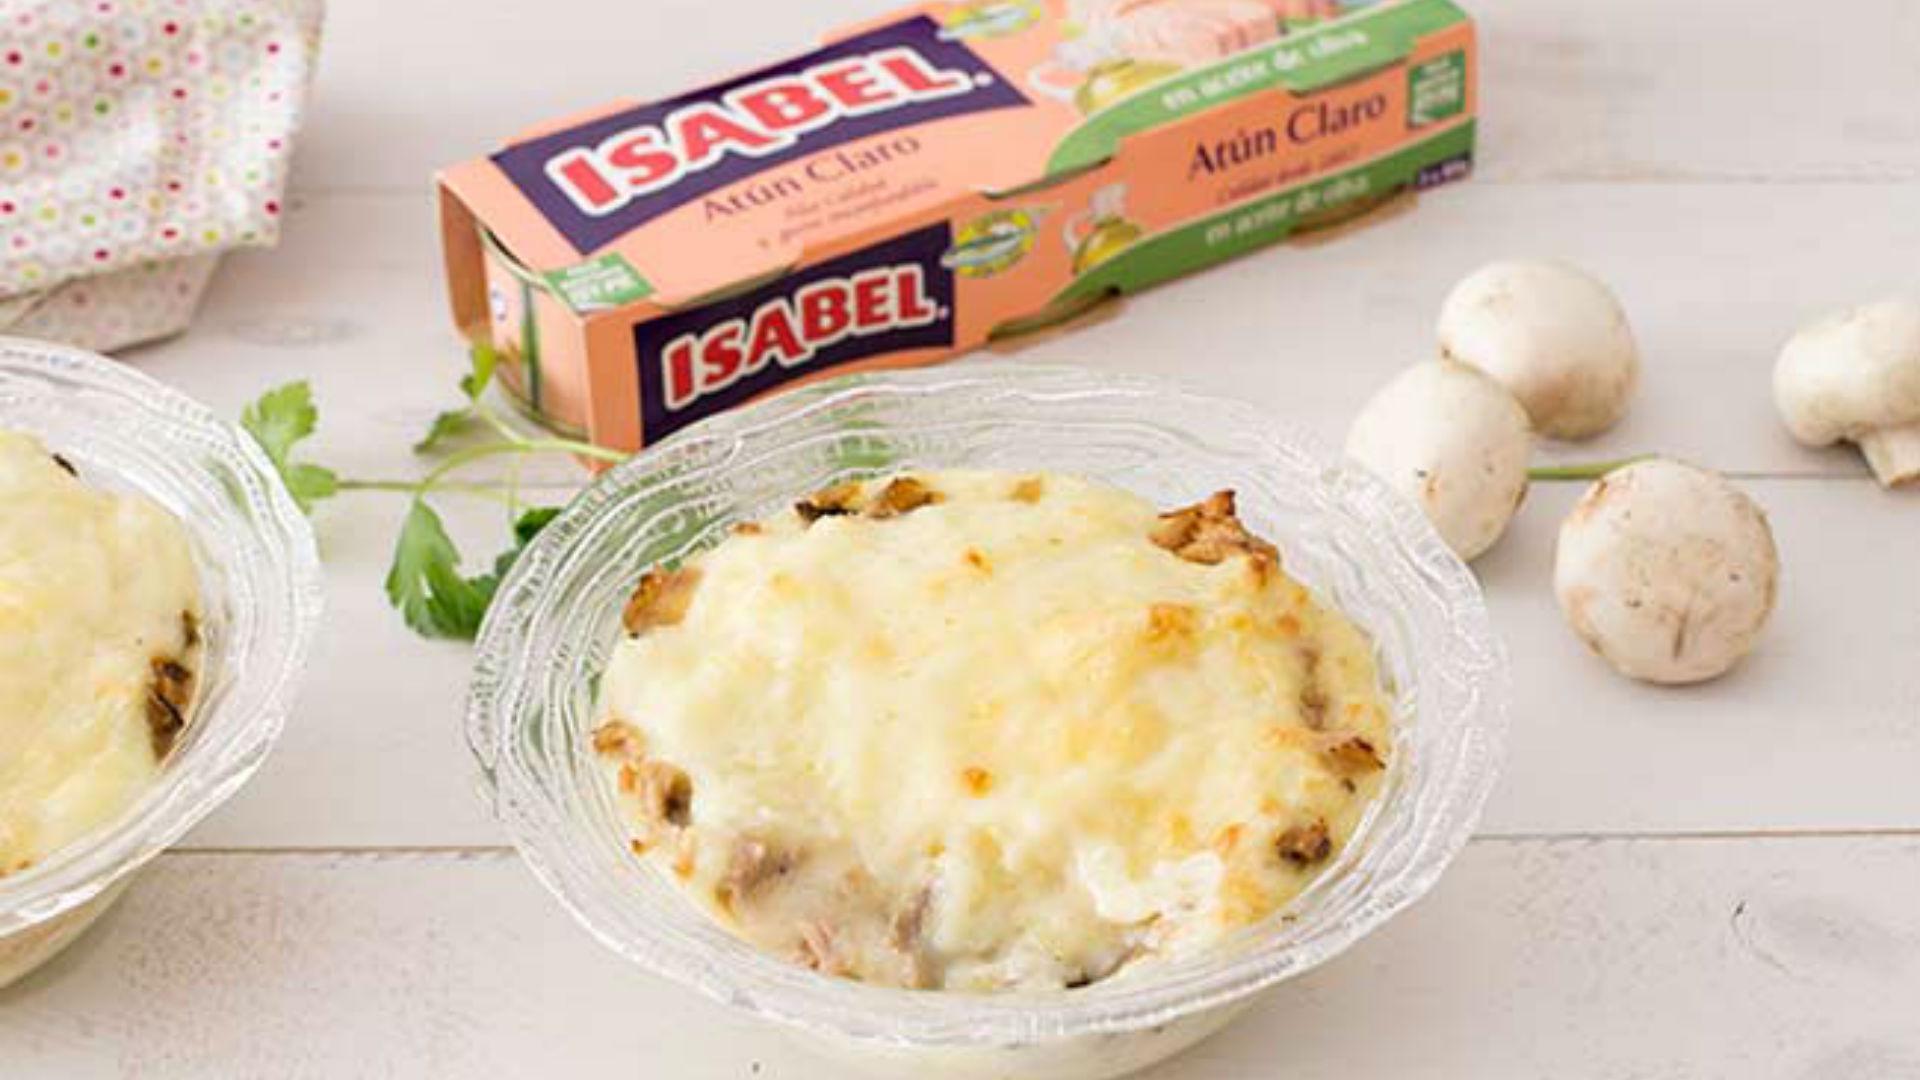 Pastel de atún con puré de patata